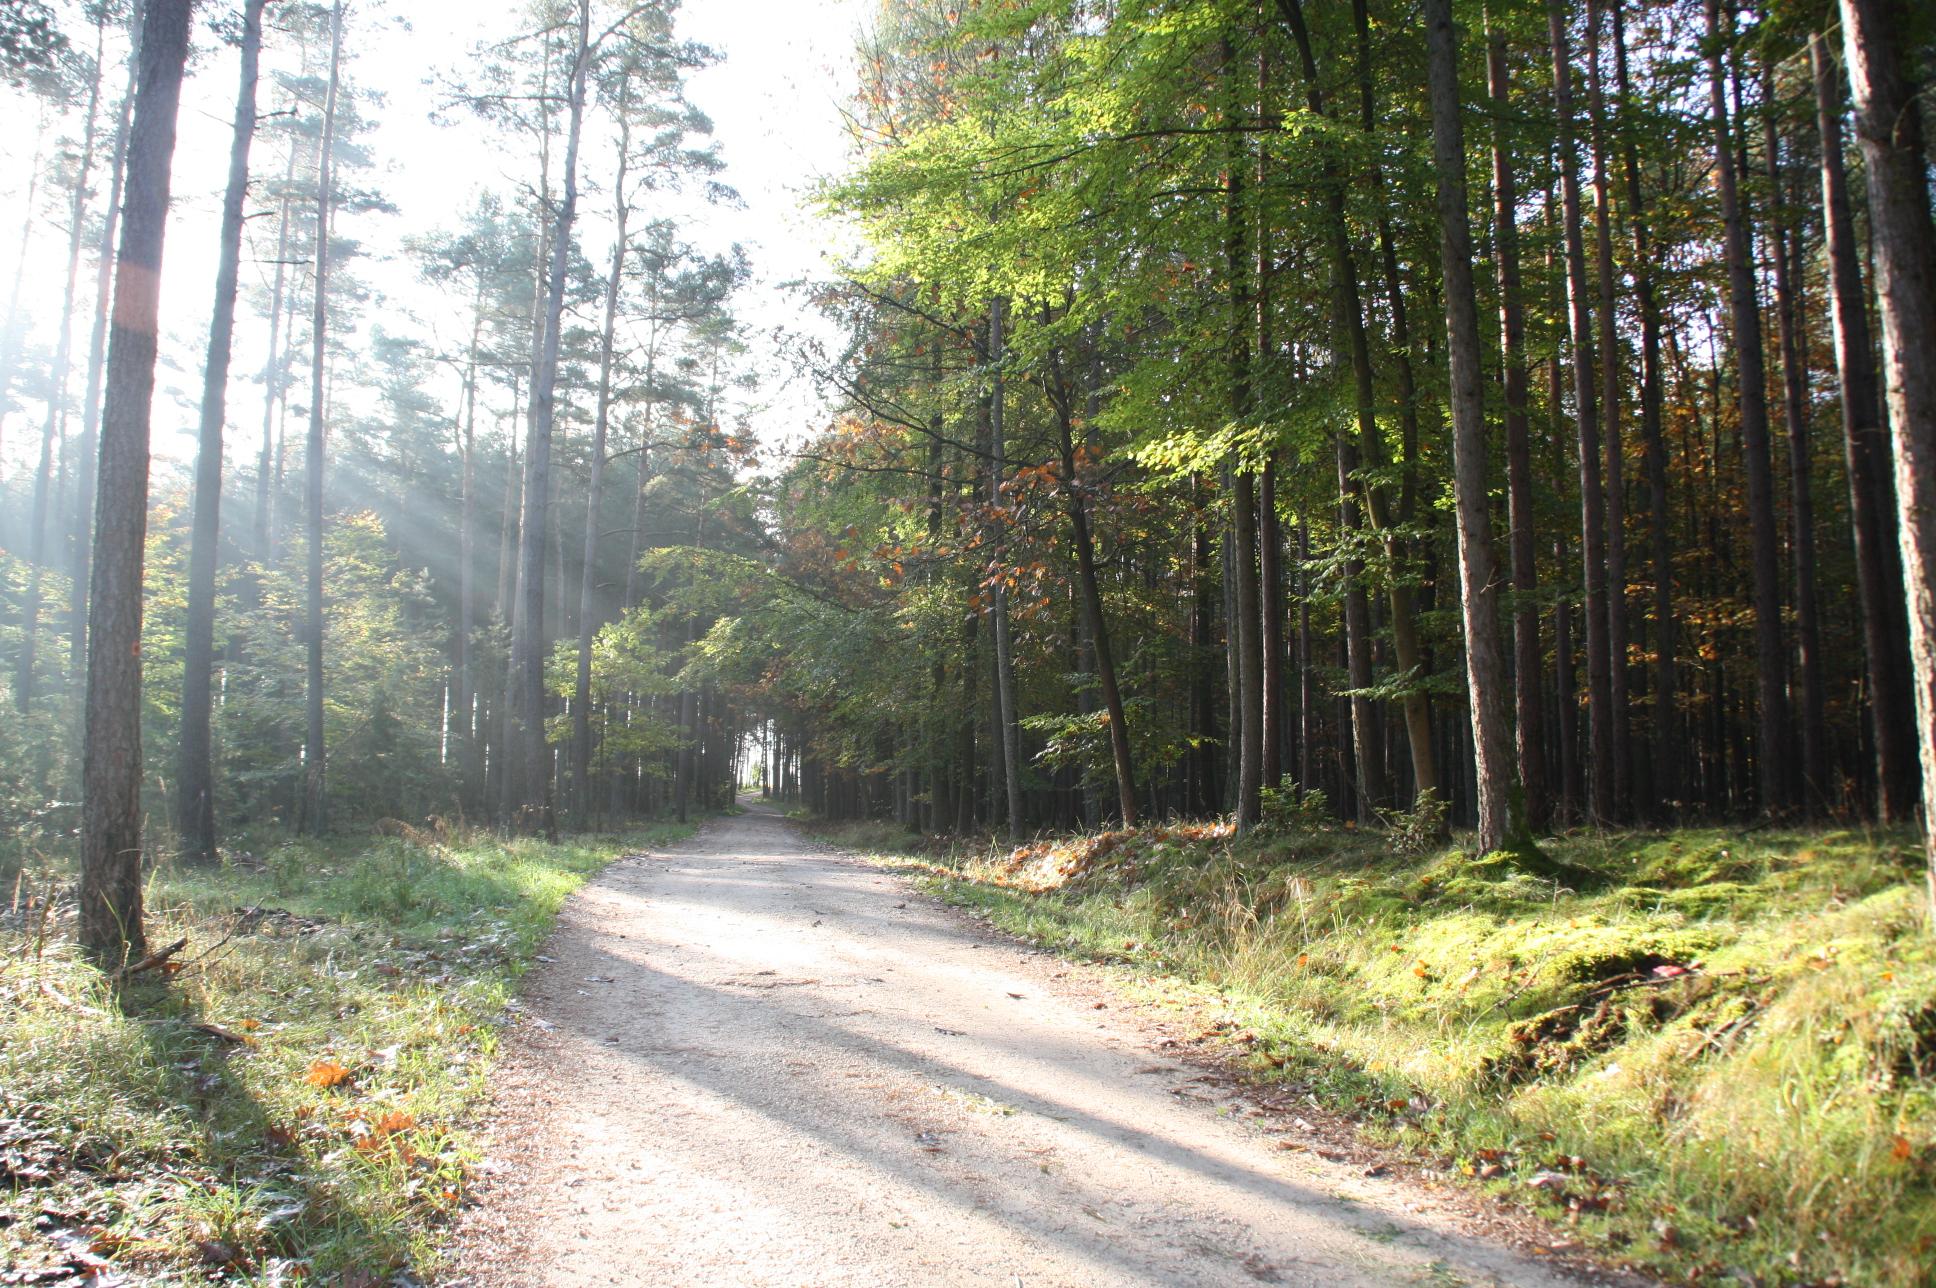 Windrad Rezelsdorf 1